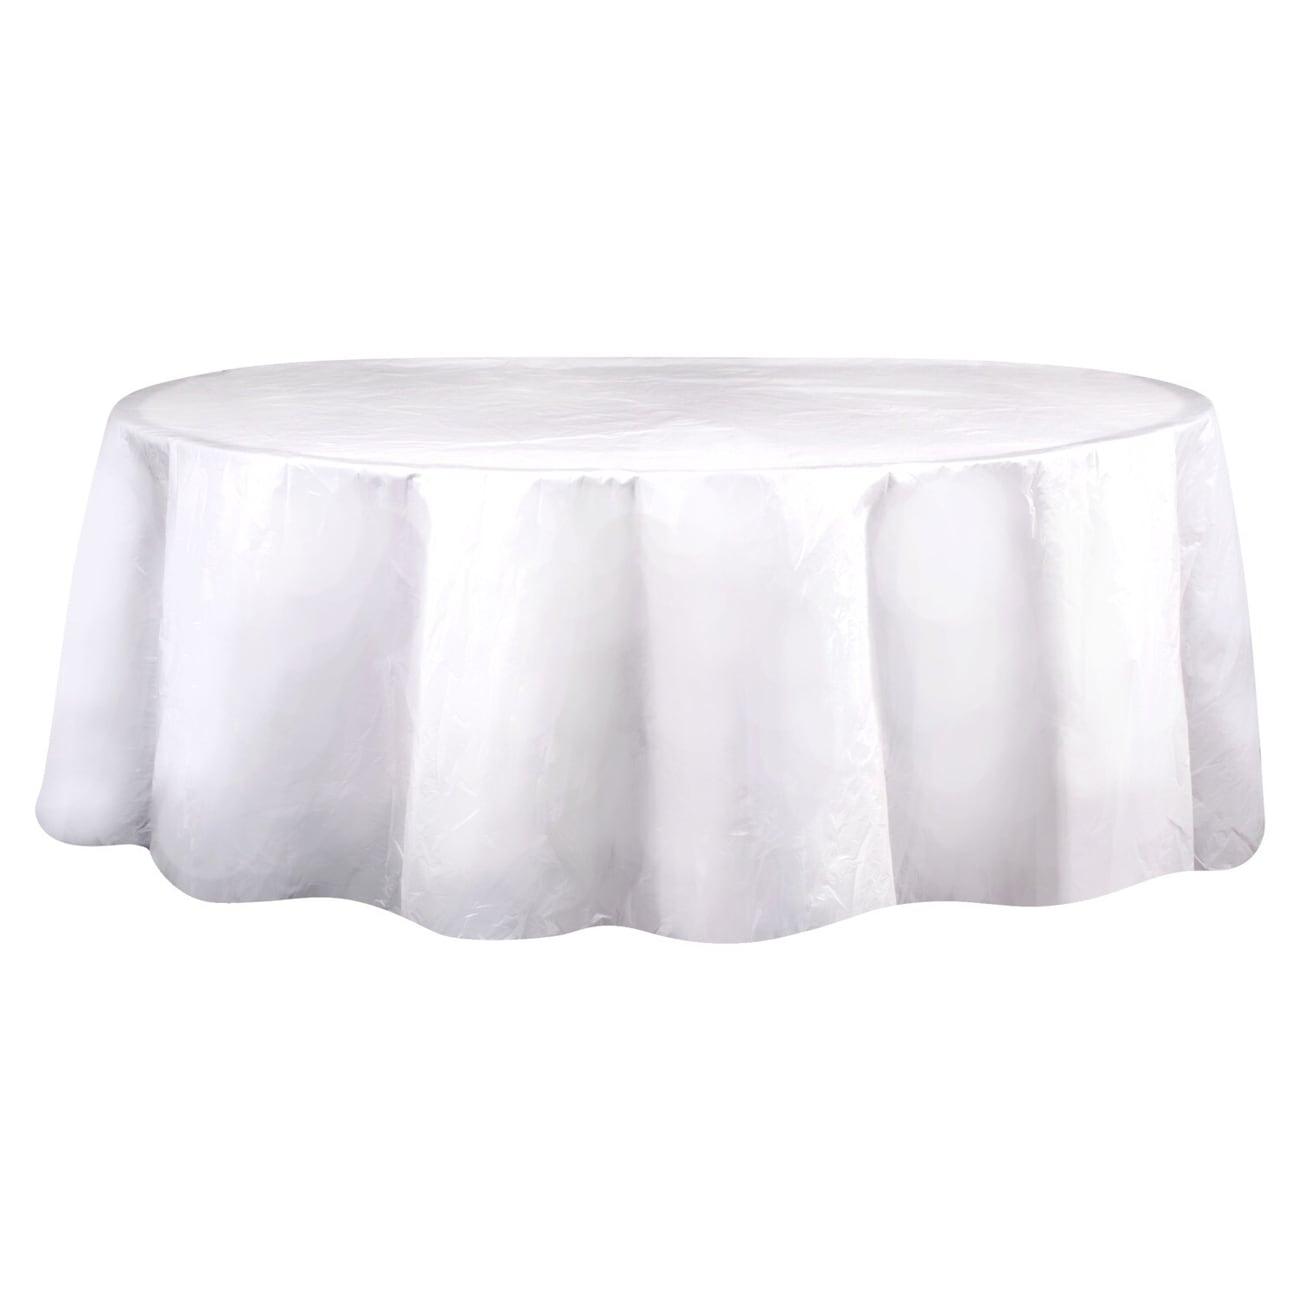 Round Table Cloths Dollar Tree Inc